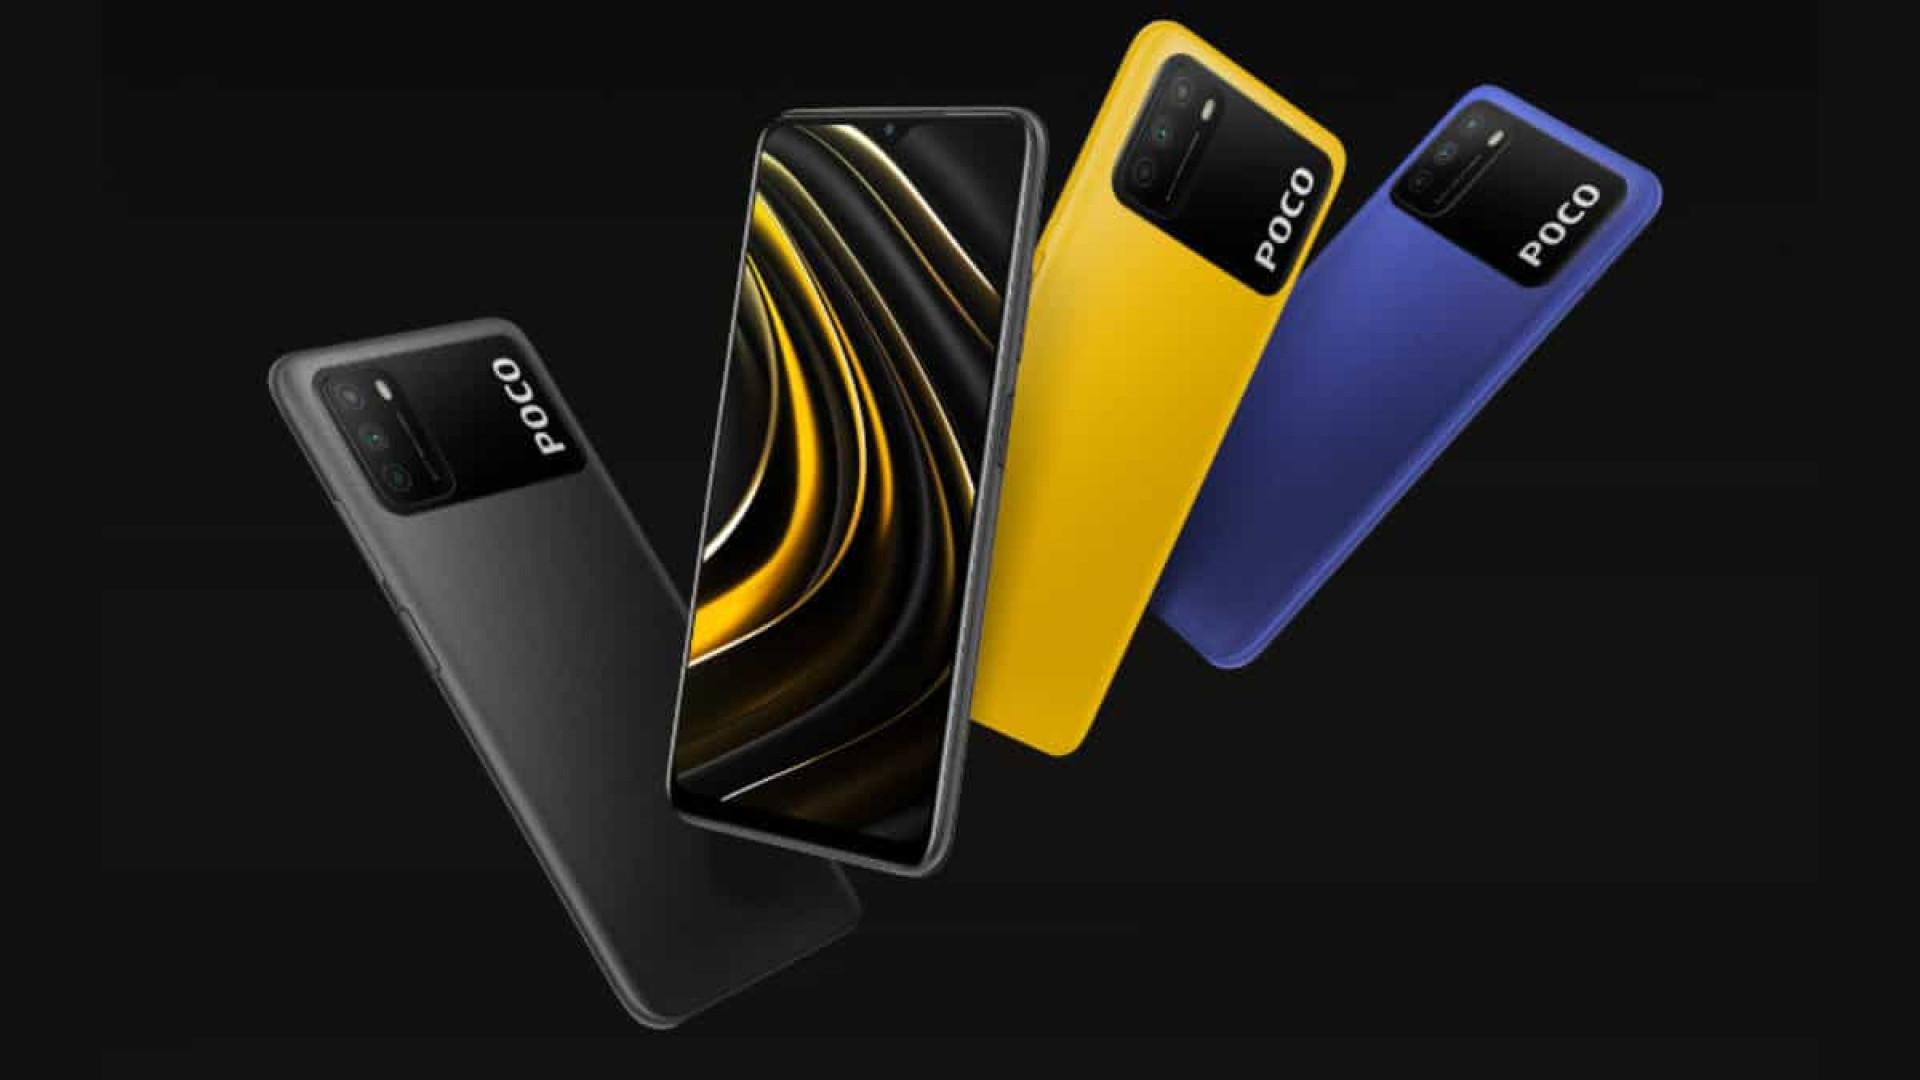 Poco M3 é o novo telemóvel da Xiaomi e custa 150 euros